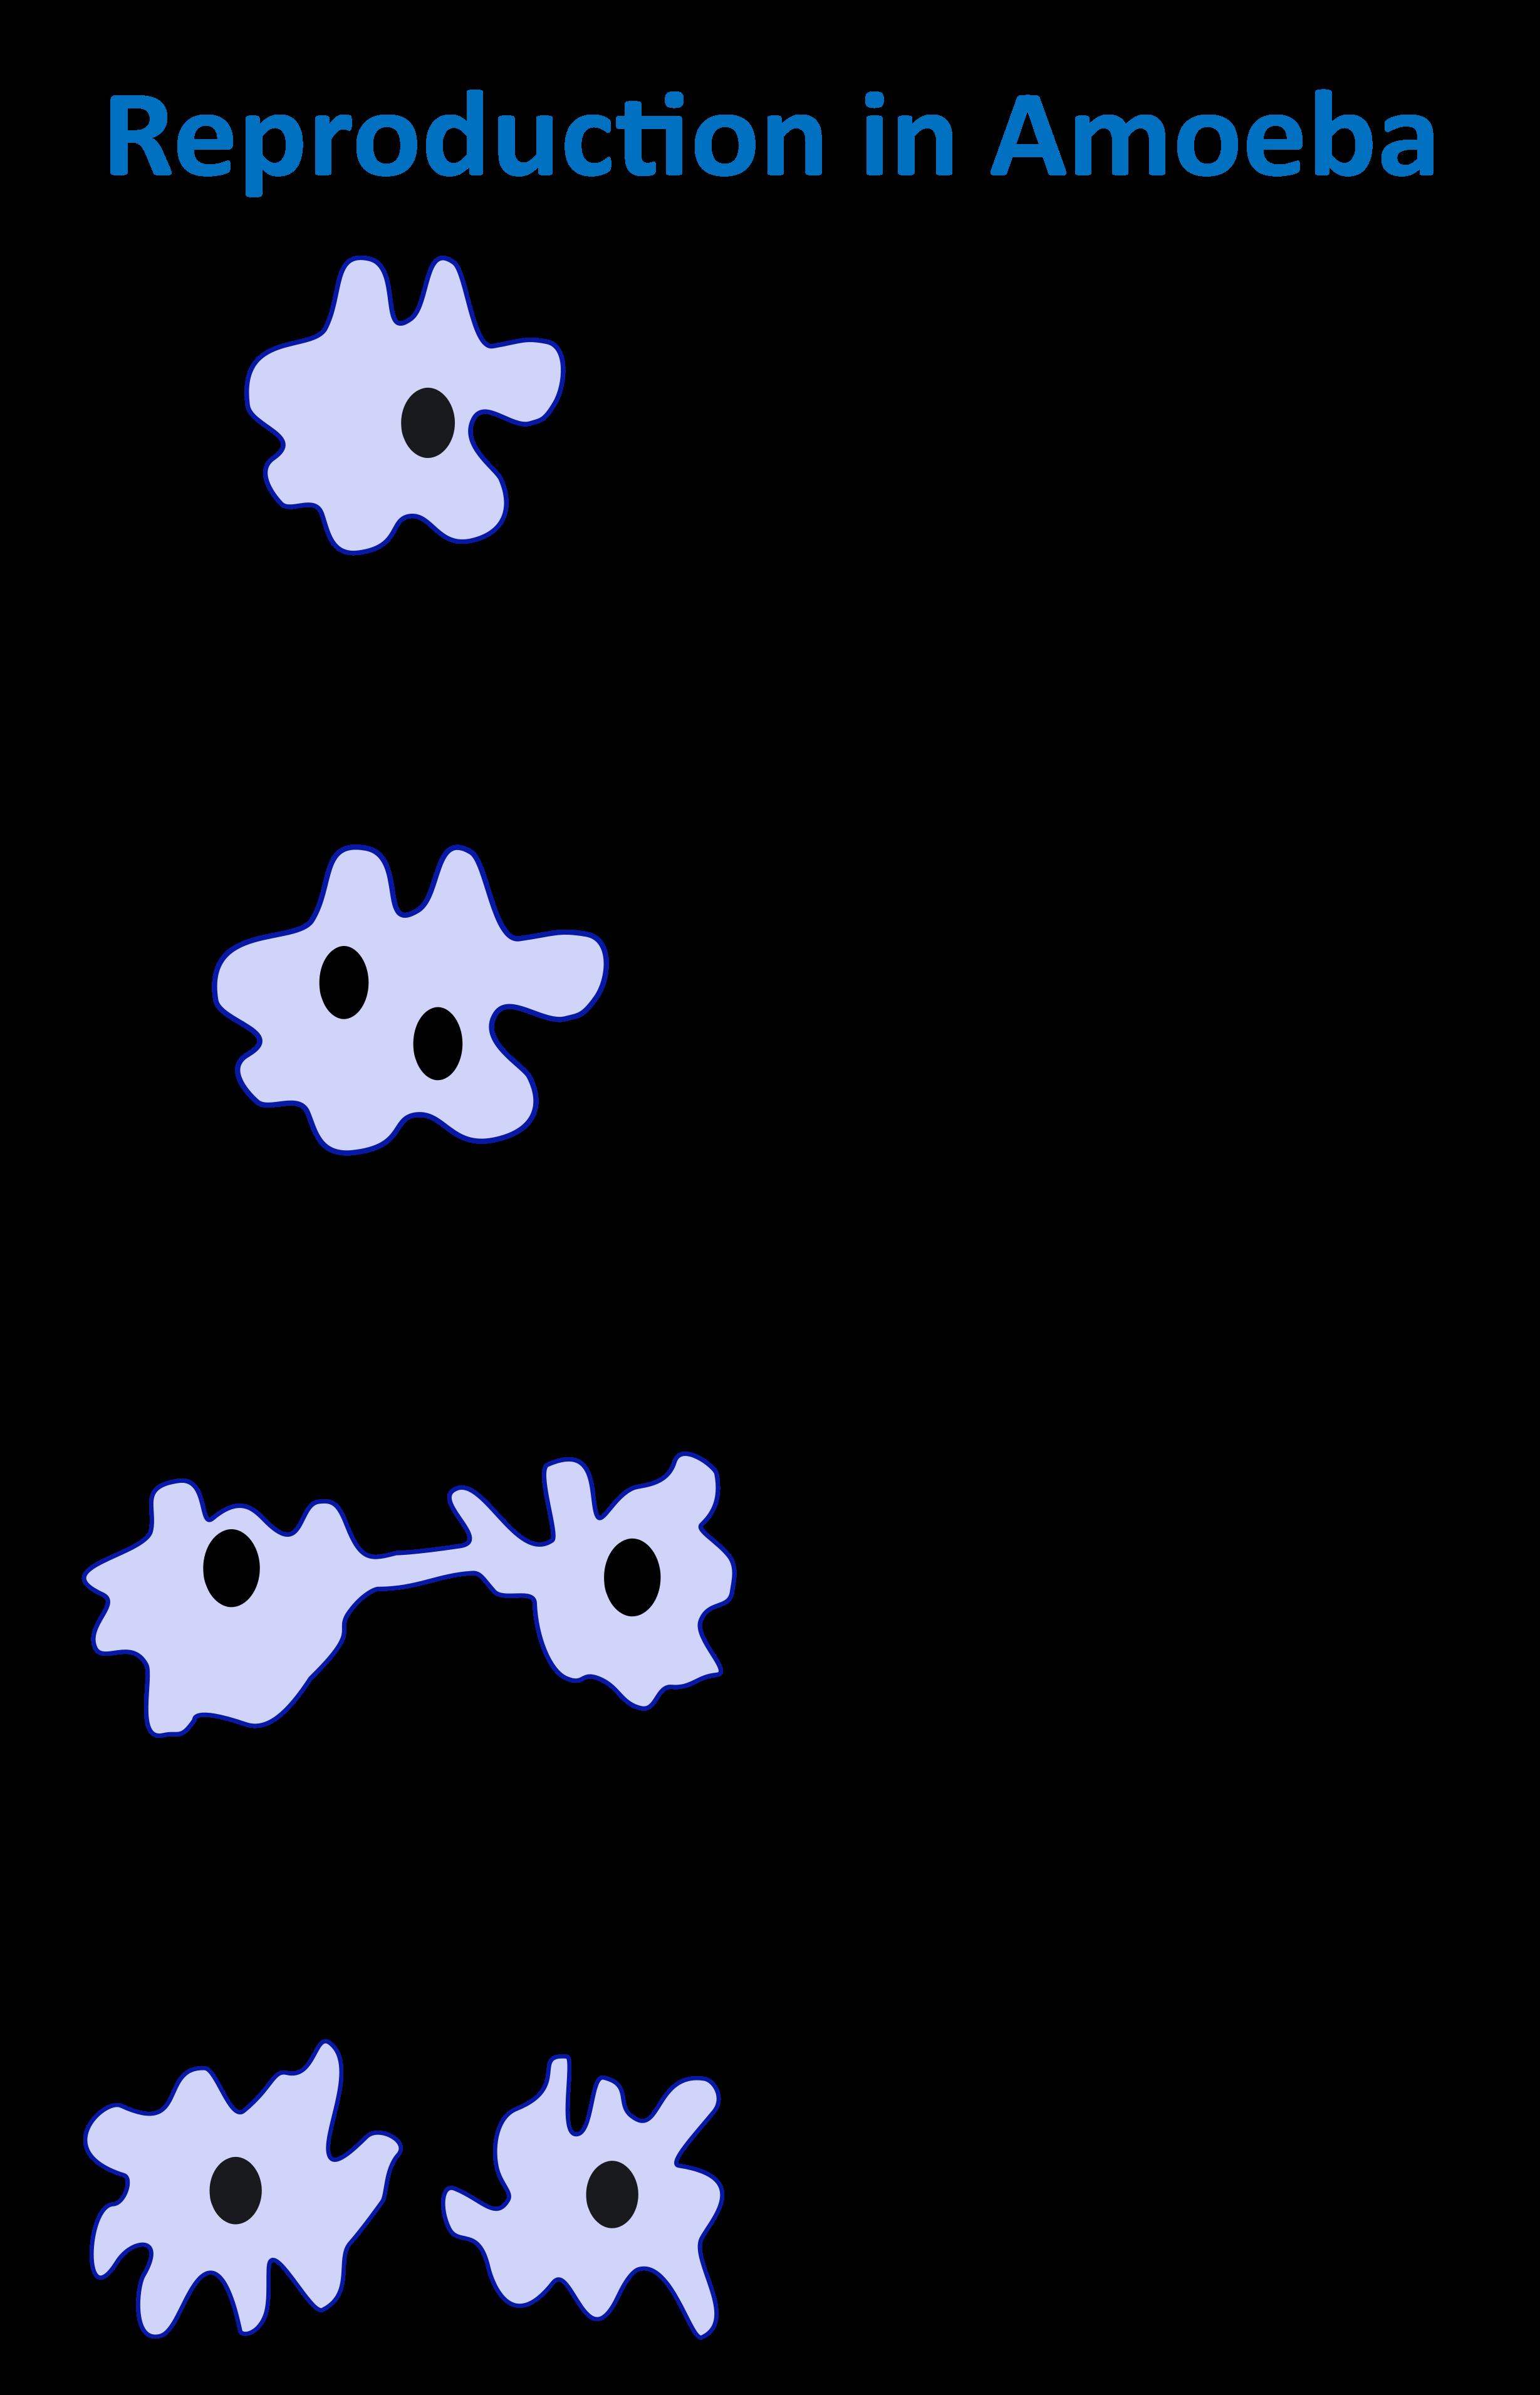 Reproduction in Amoeba.png